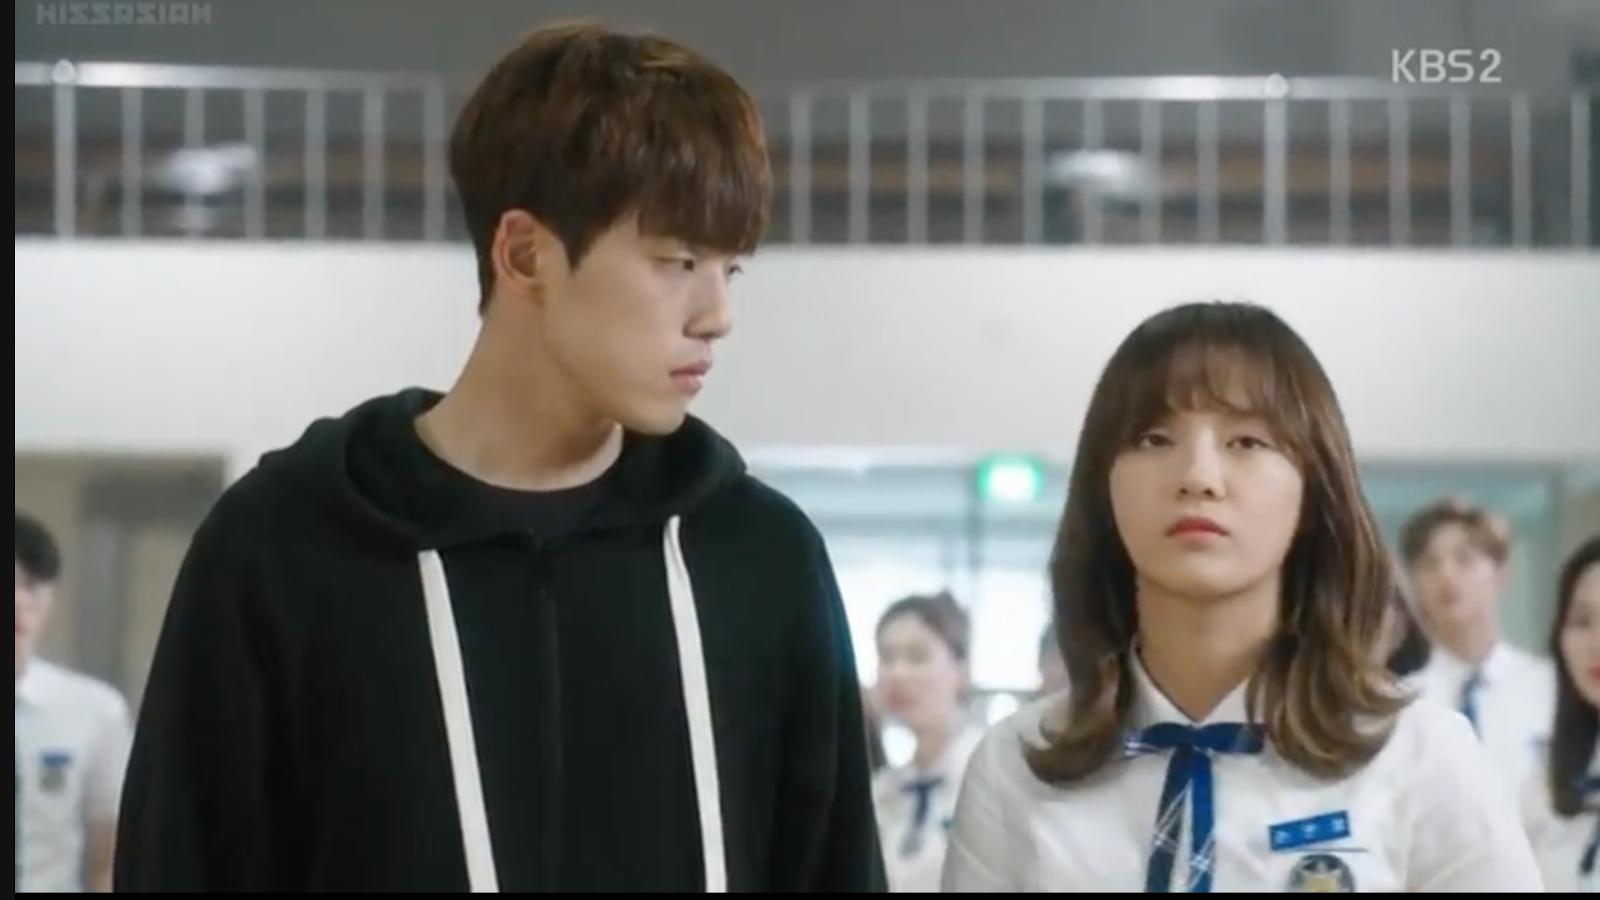 Precious Moments: School 2017 Korean Drama, Cast, Story Highlights